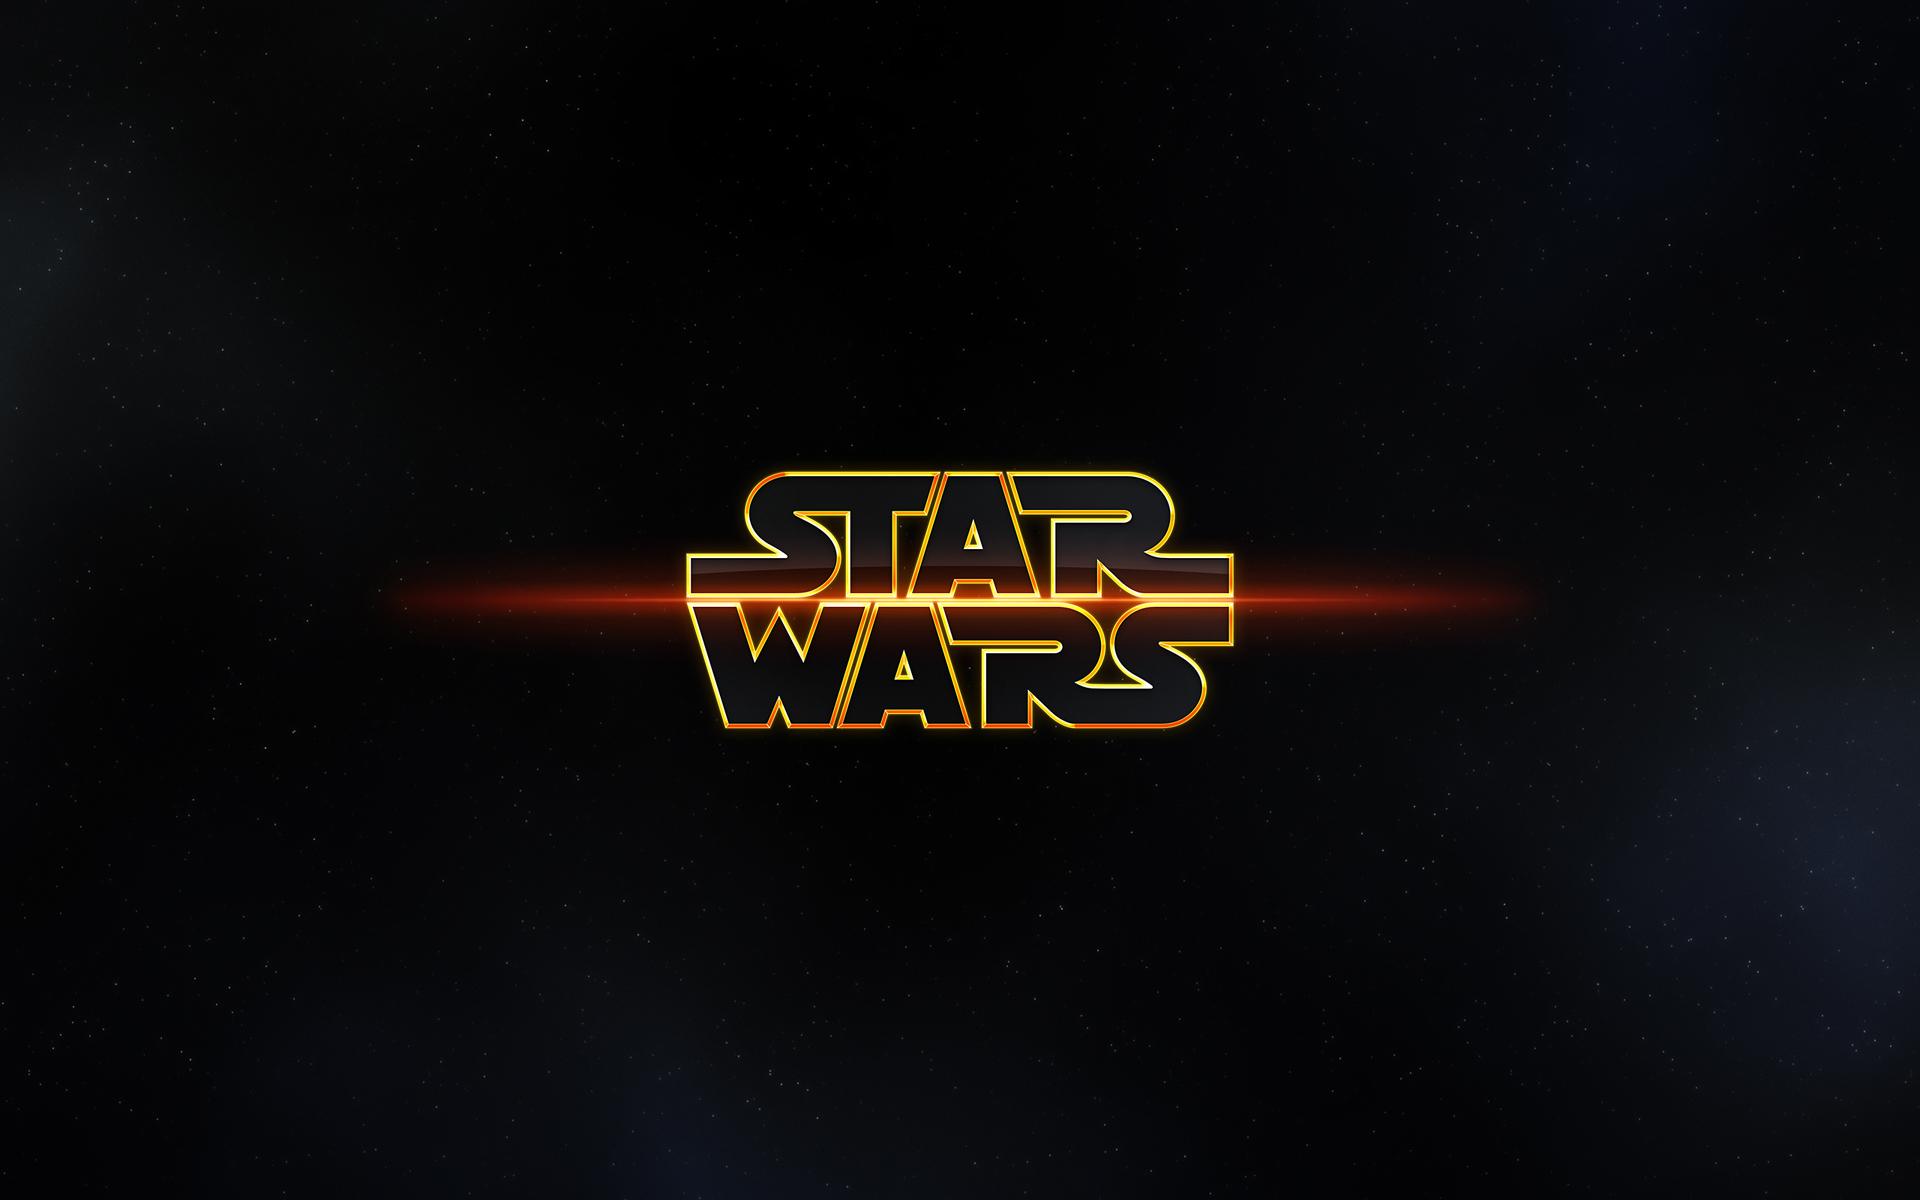 lego star wars star wars hd wallpapers star war game 1920x1200